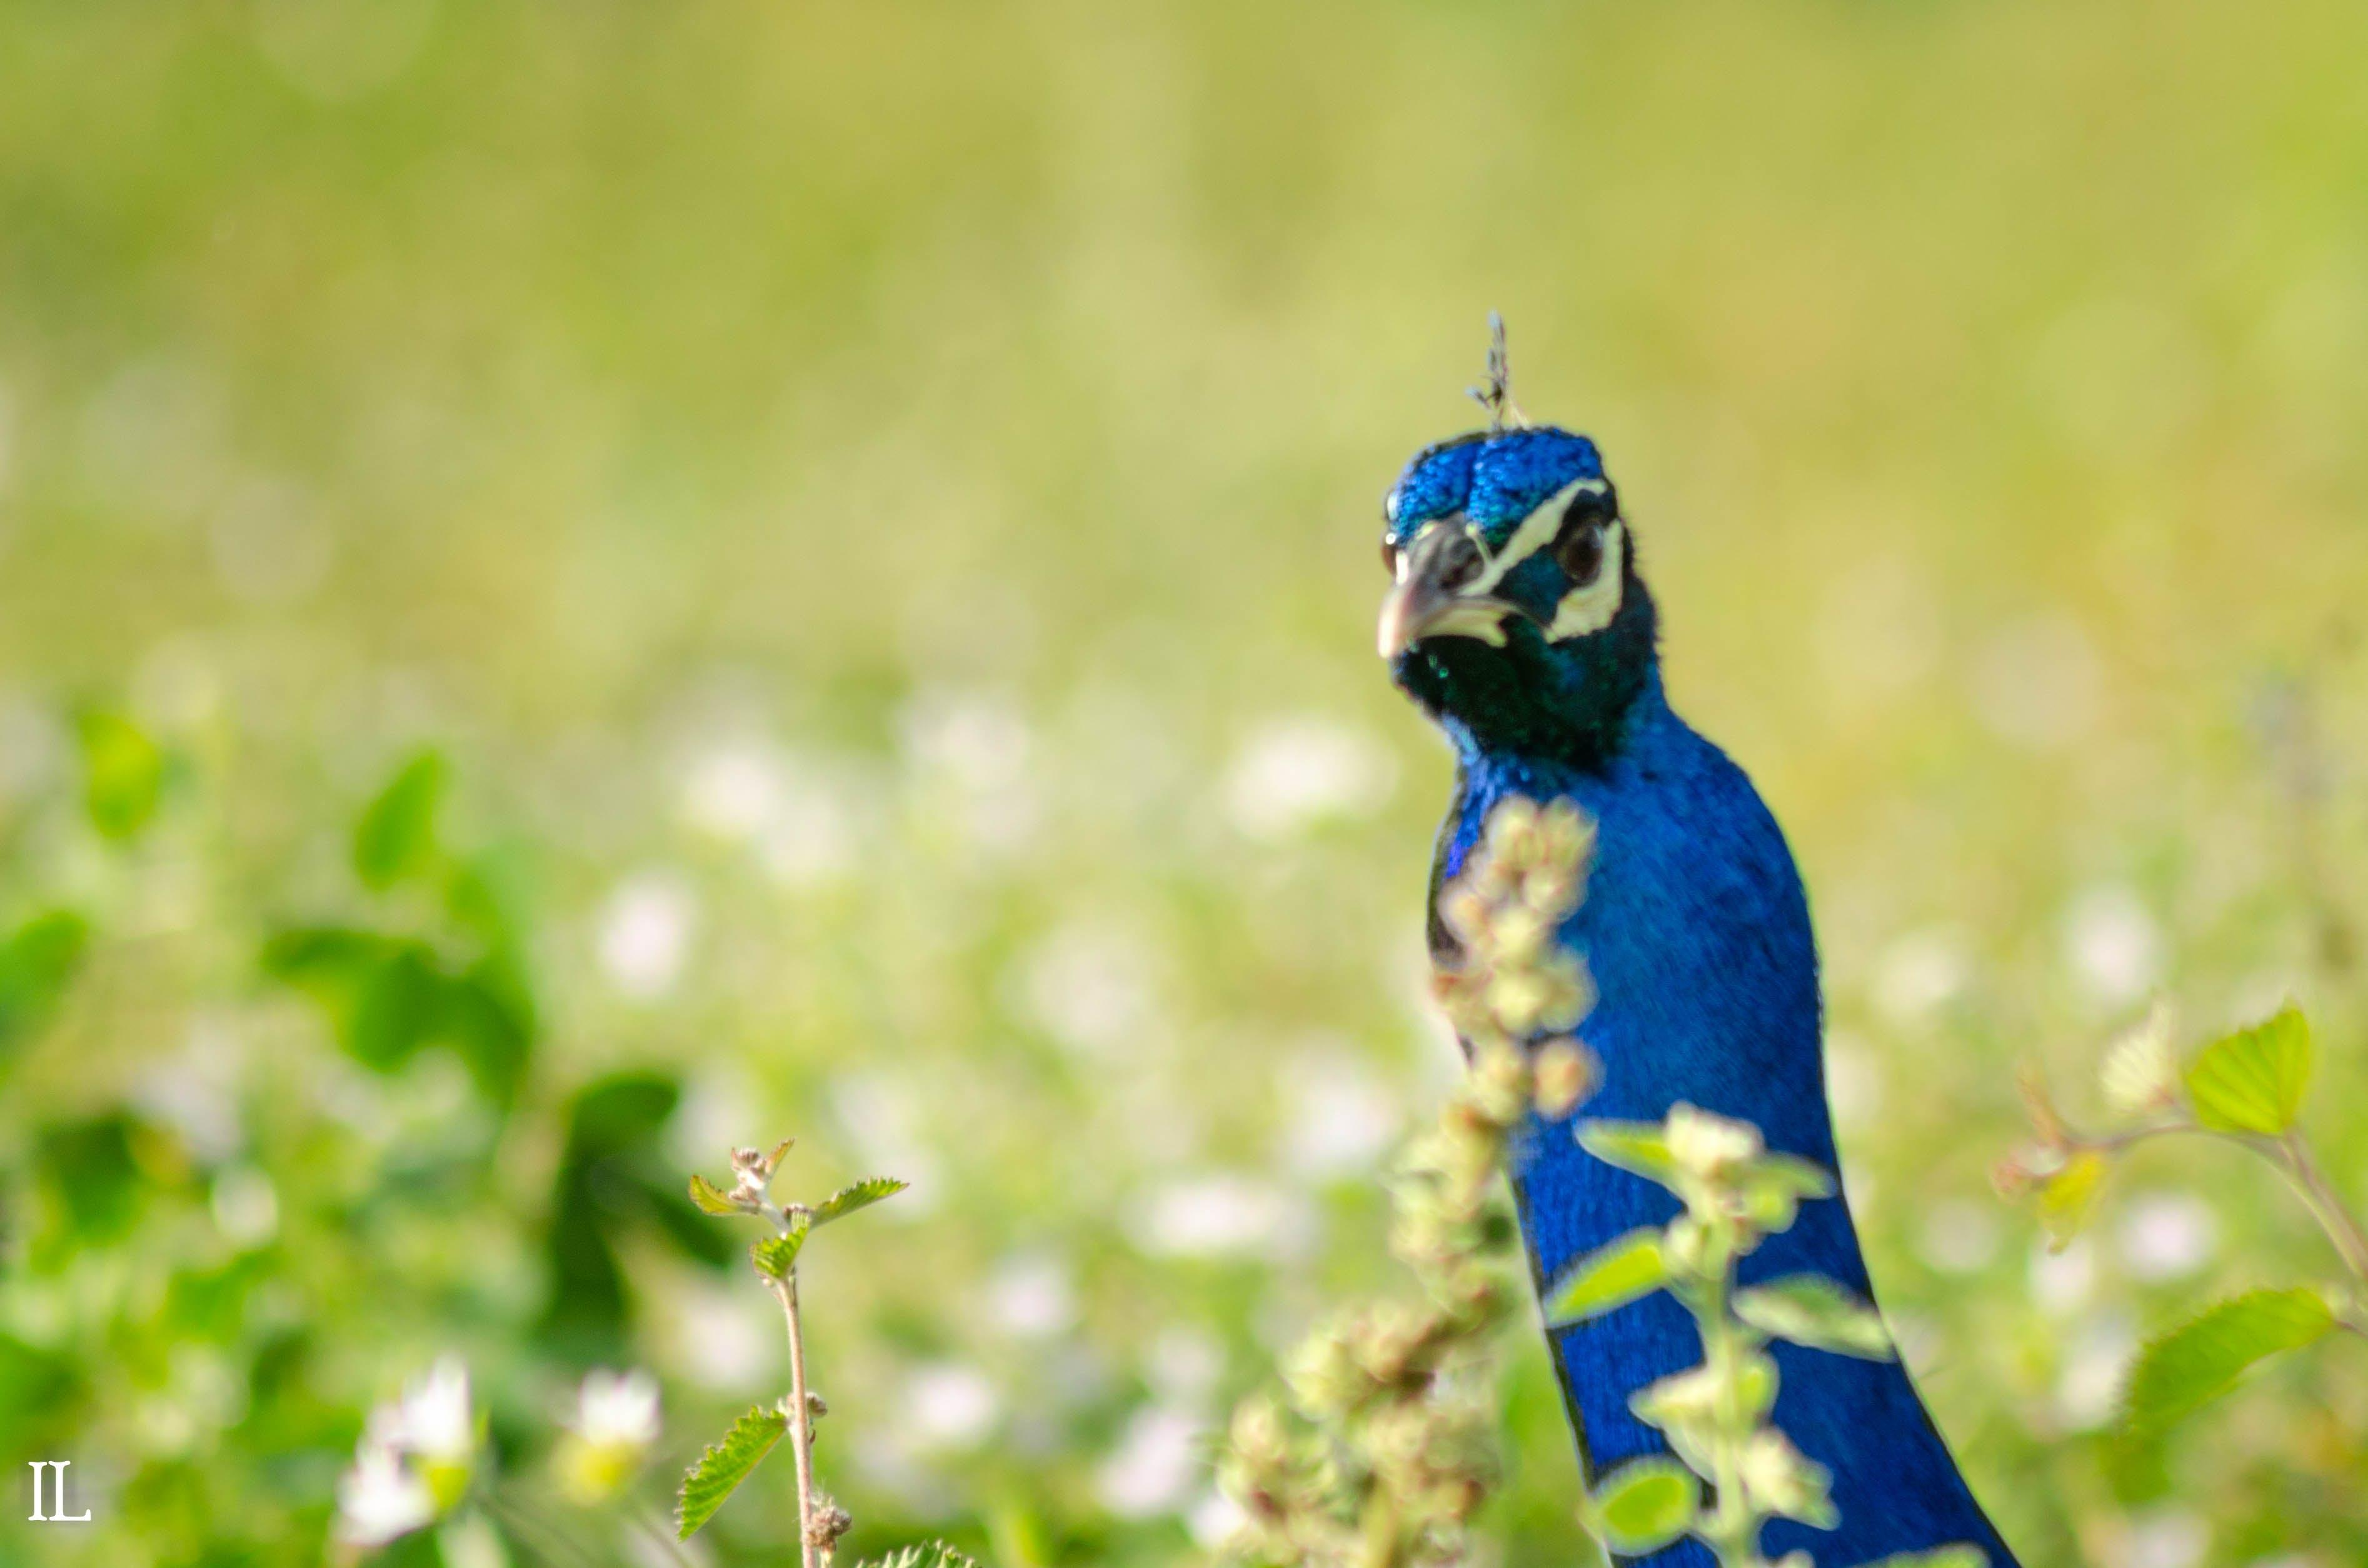 Free stock photo of peacock